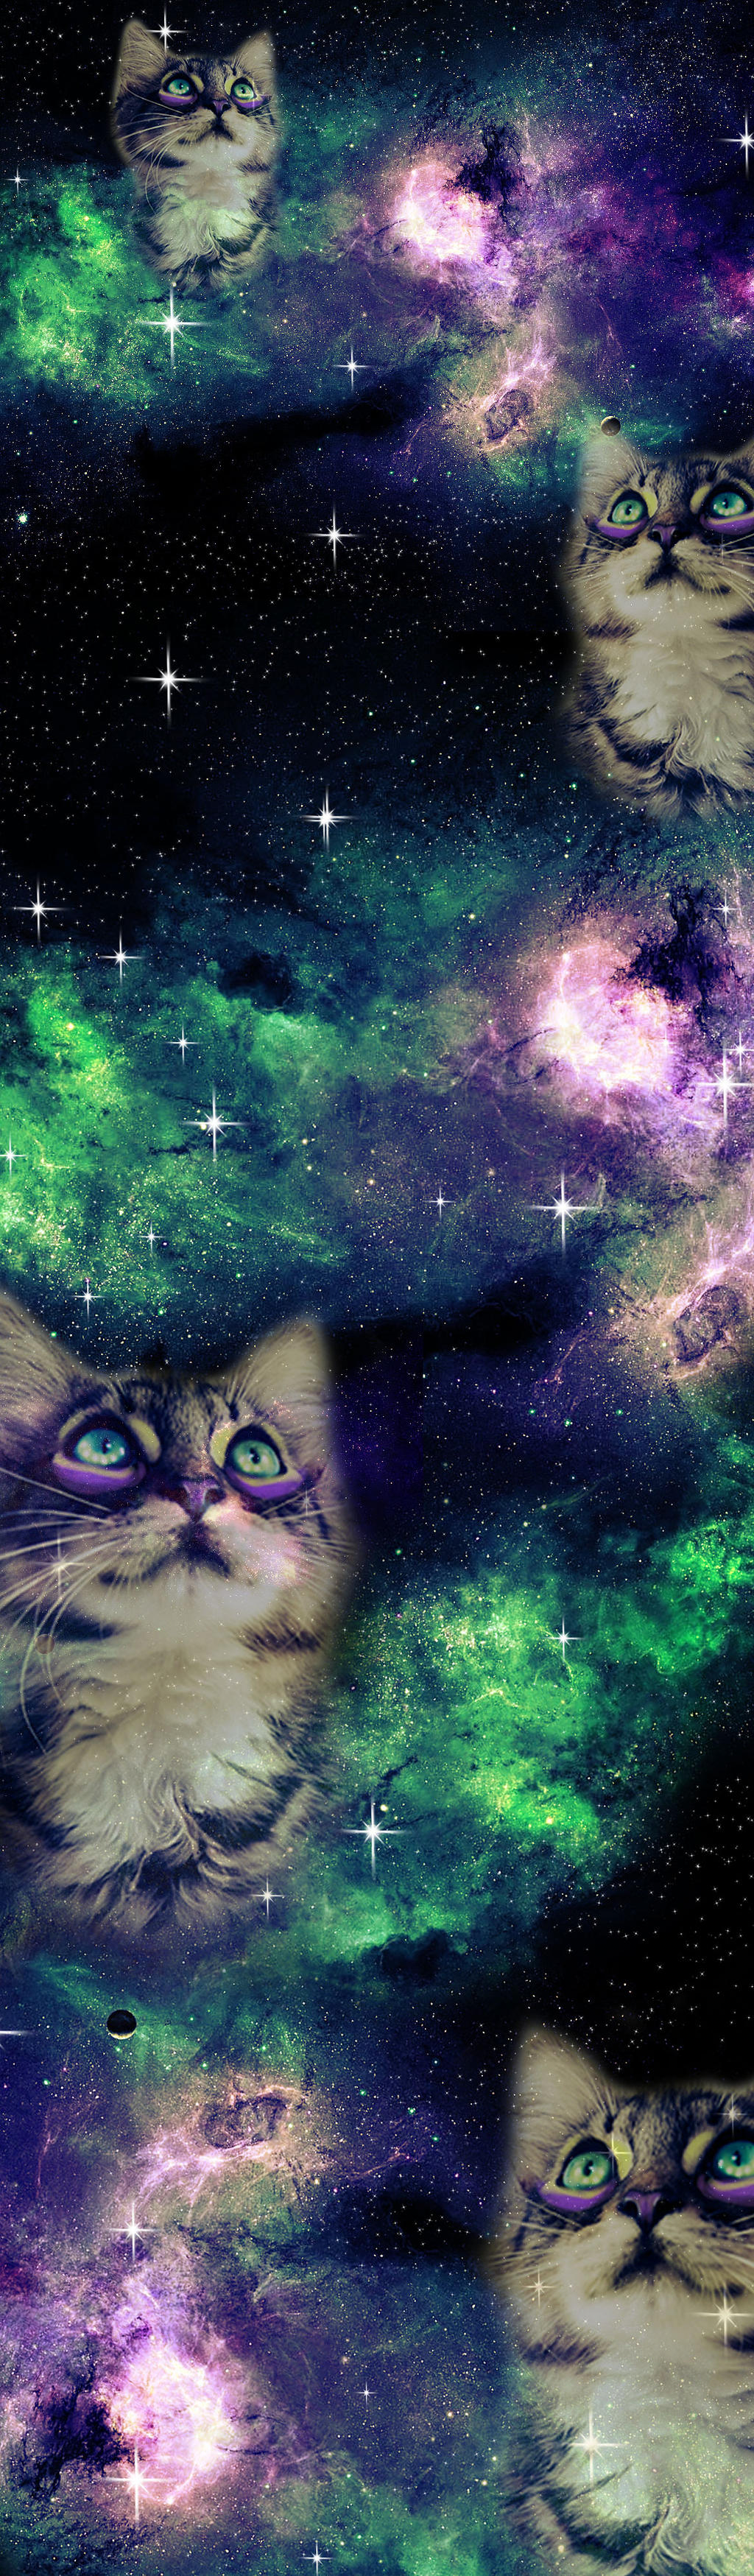 Galaxy Cat Box Background. by Sarah--Elizabeth on DeviantArt